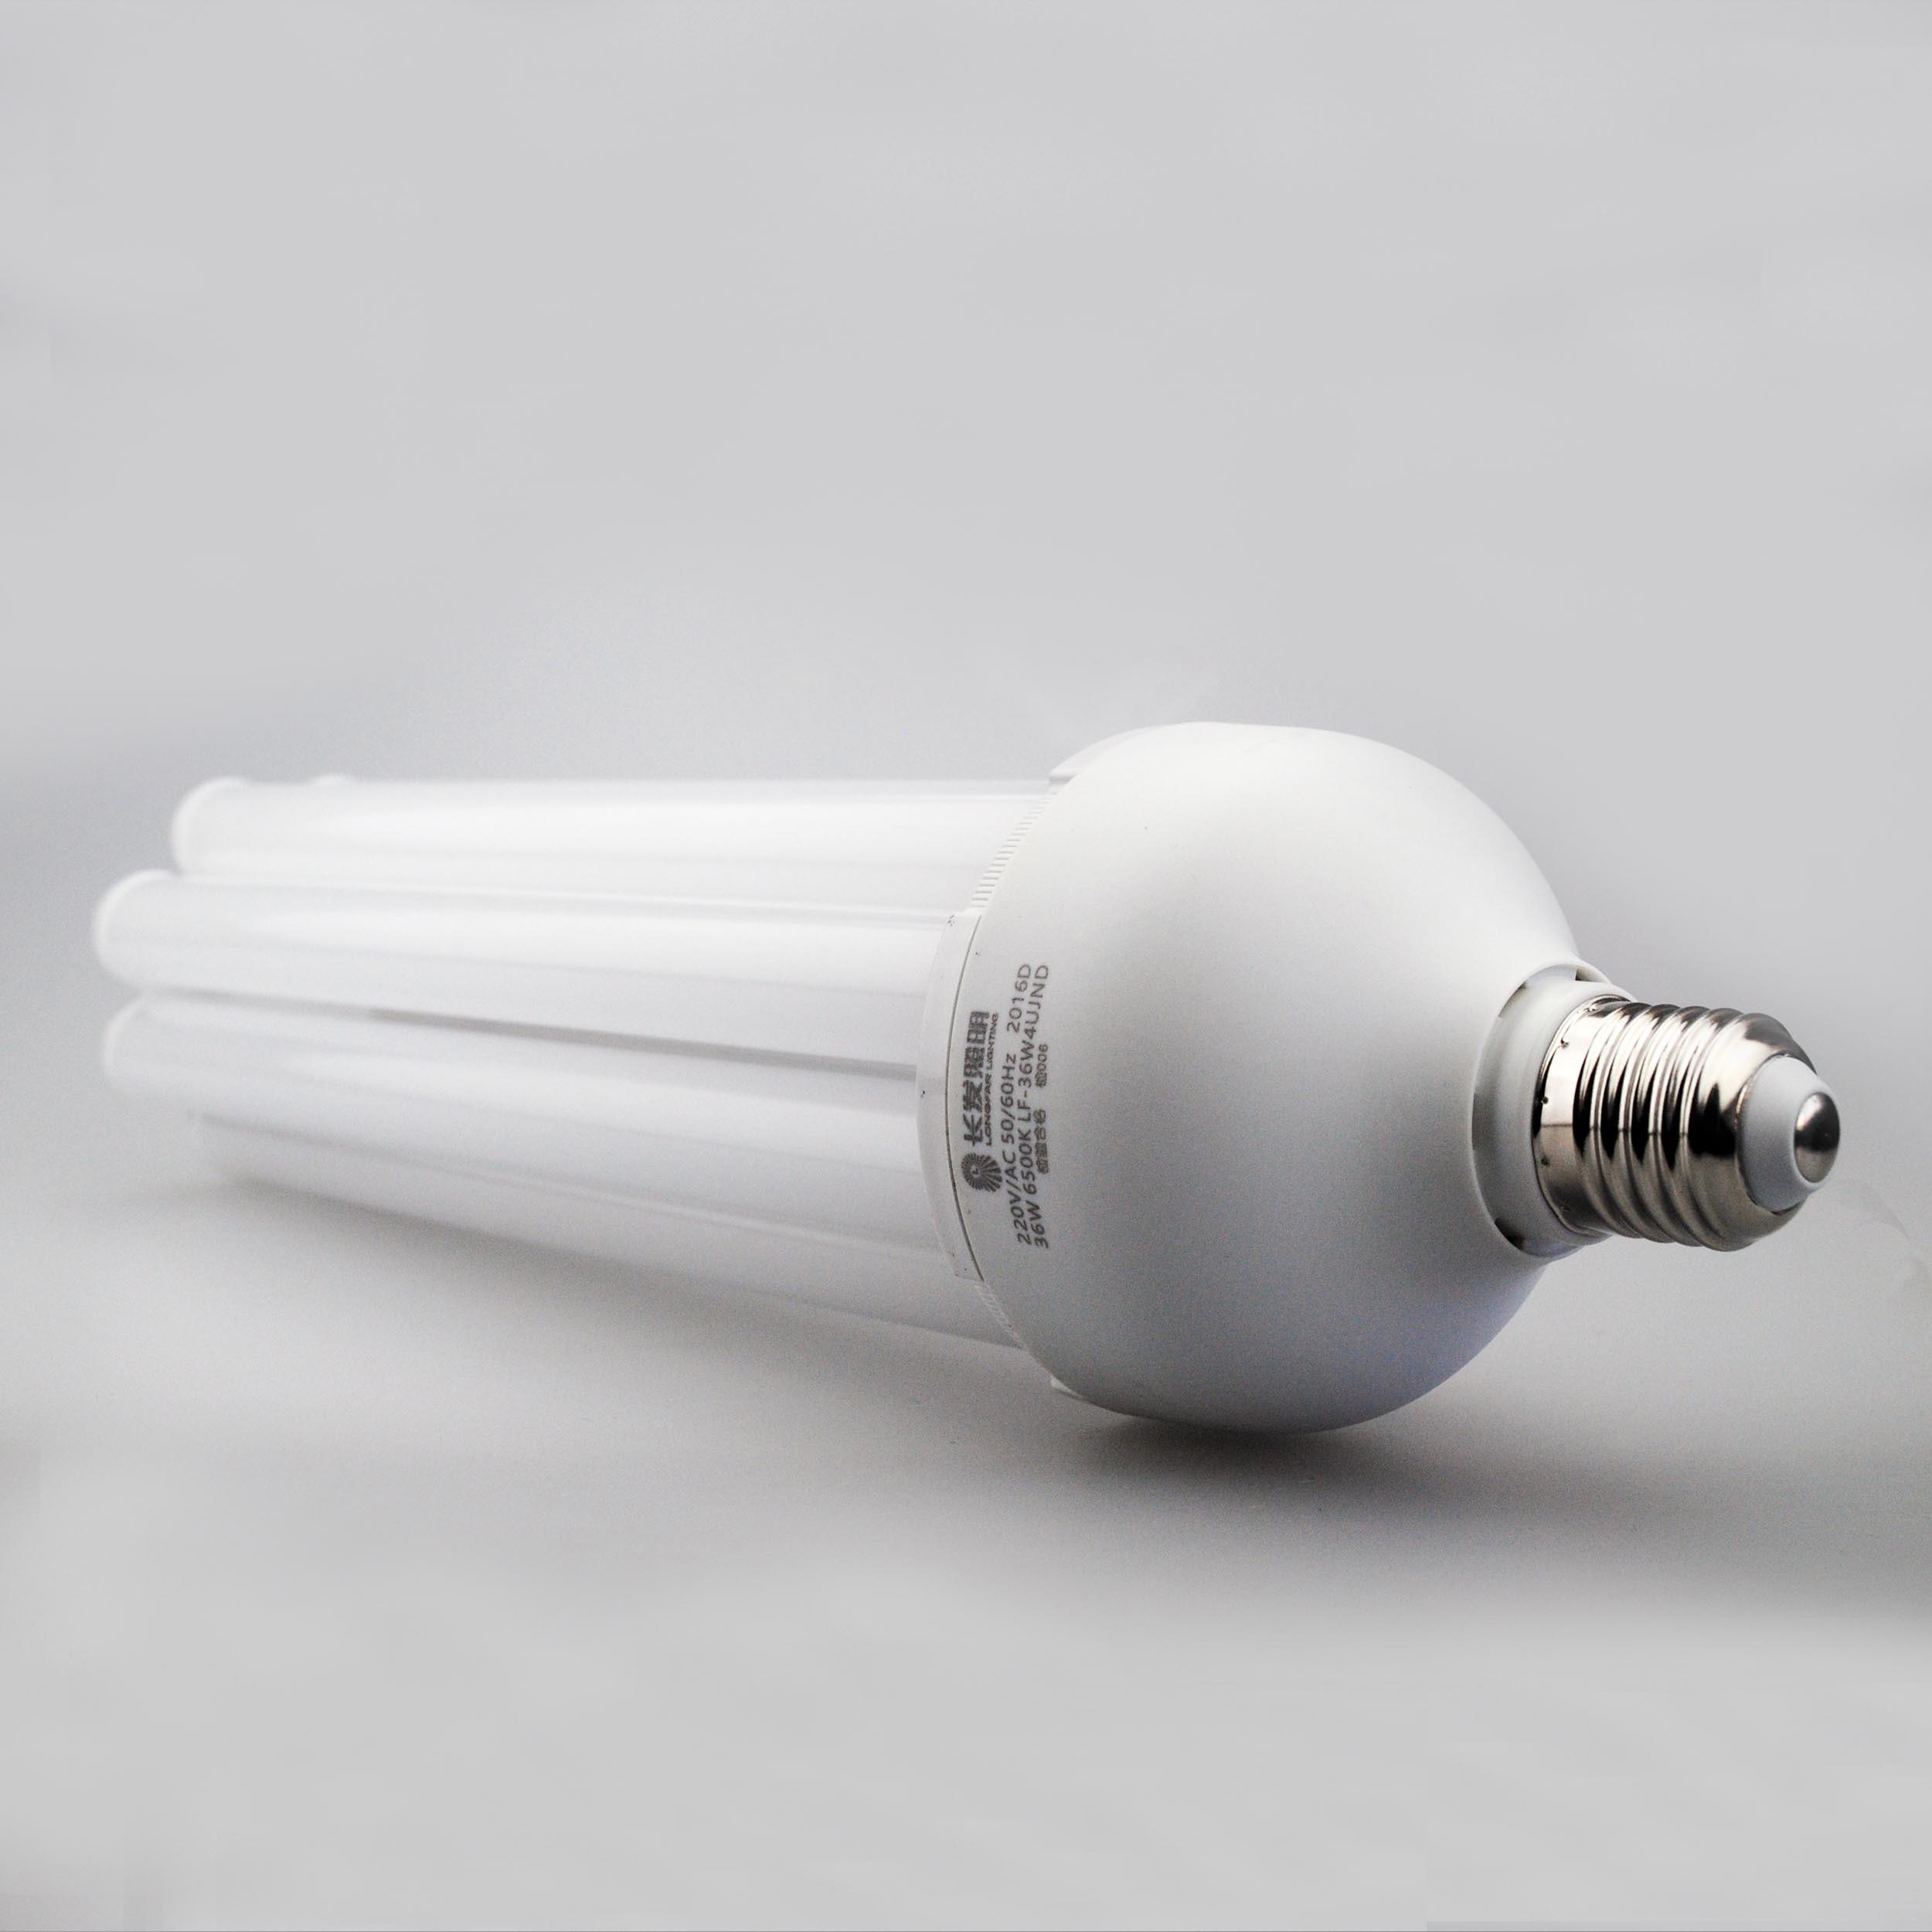 36W 2016 Energy Saving LED Corn Lamps